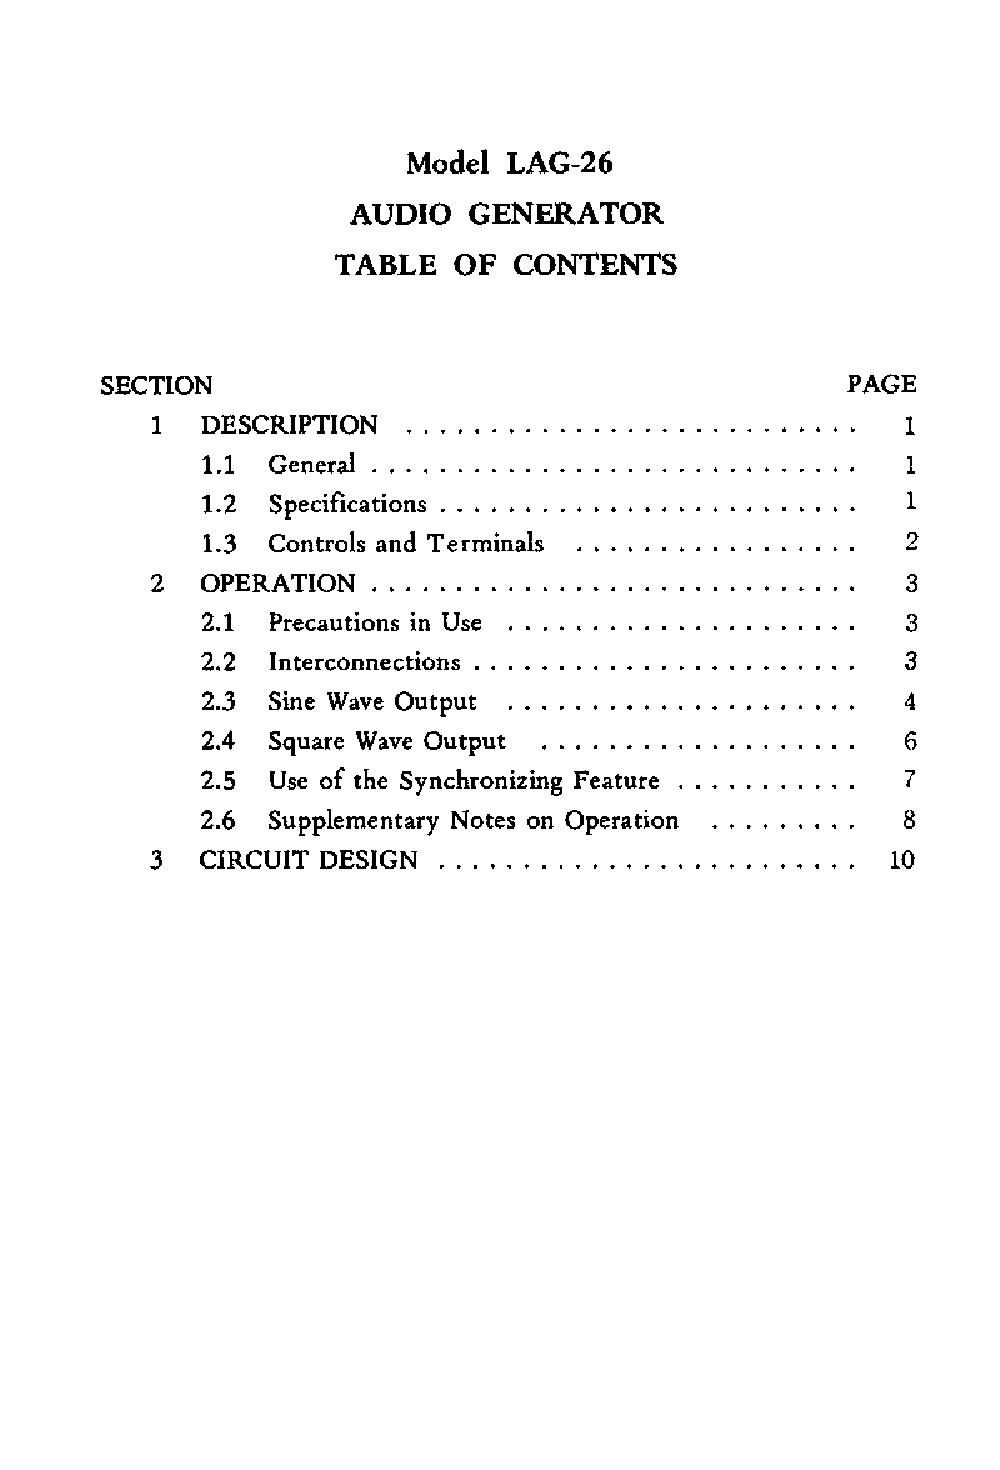 LEADER LAG-26 AUDIO-GENERATOR SM Service Manual download, schematics